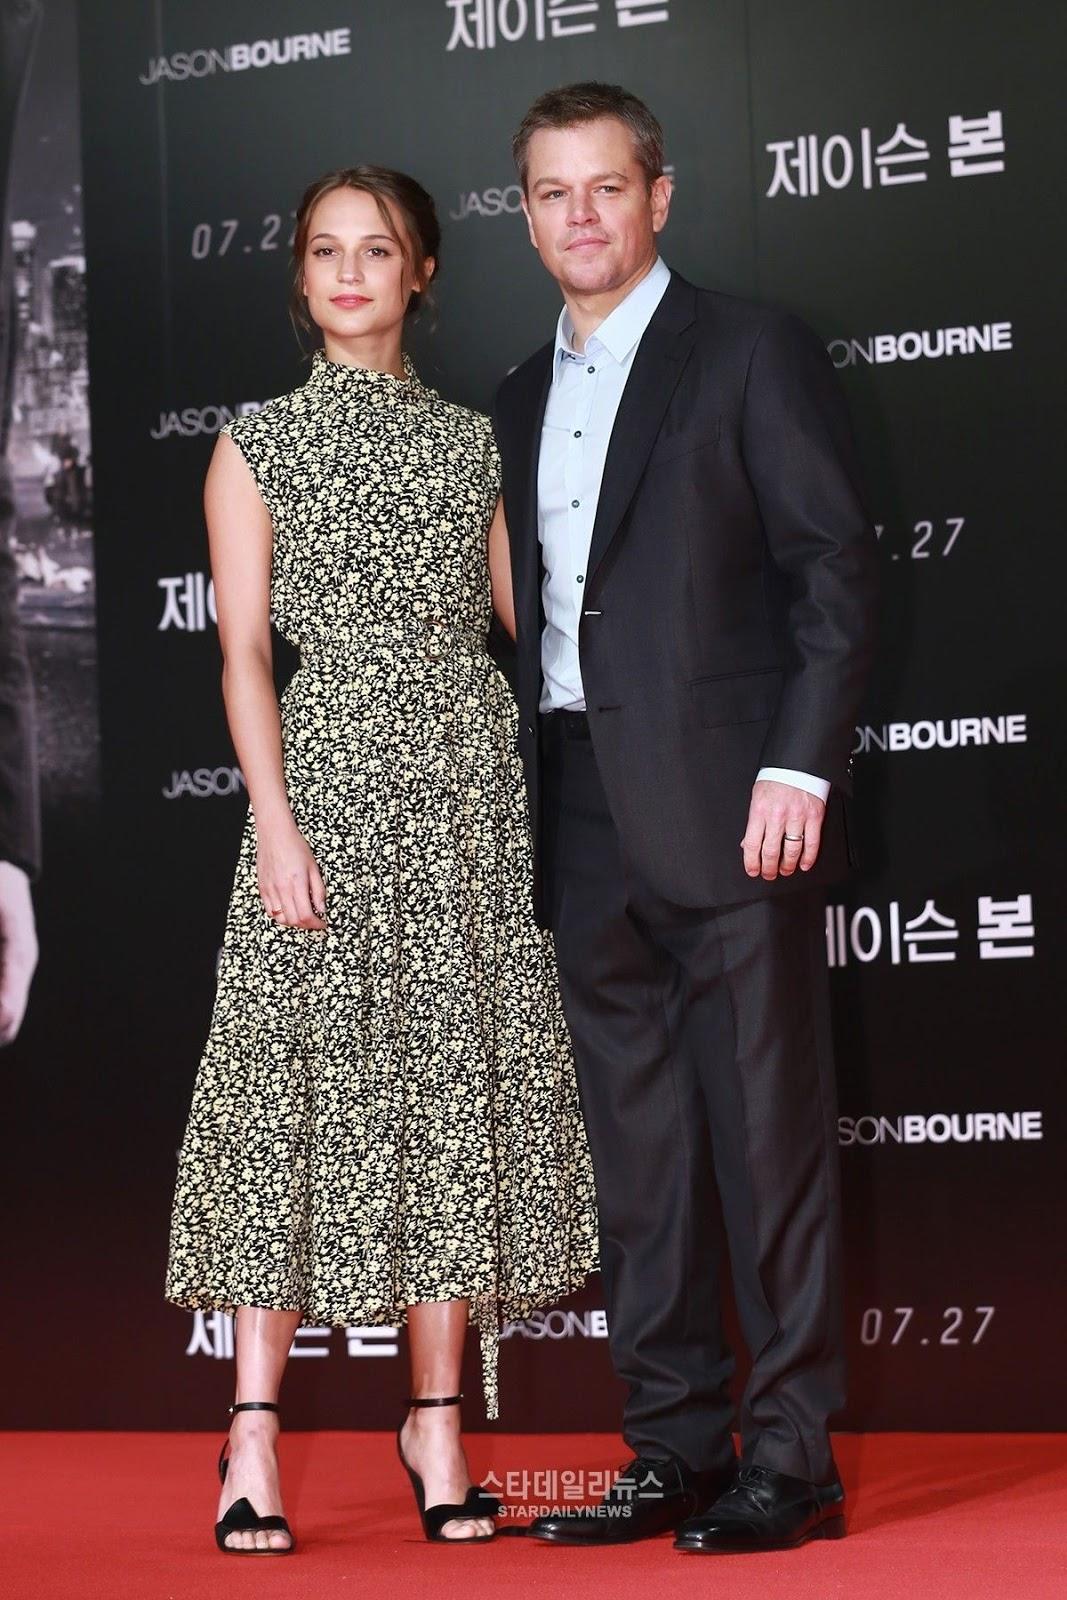 HQ Photos of Alicia Vikander At Jason Bourne Photocall In Seoul